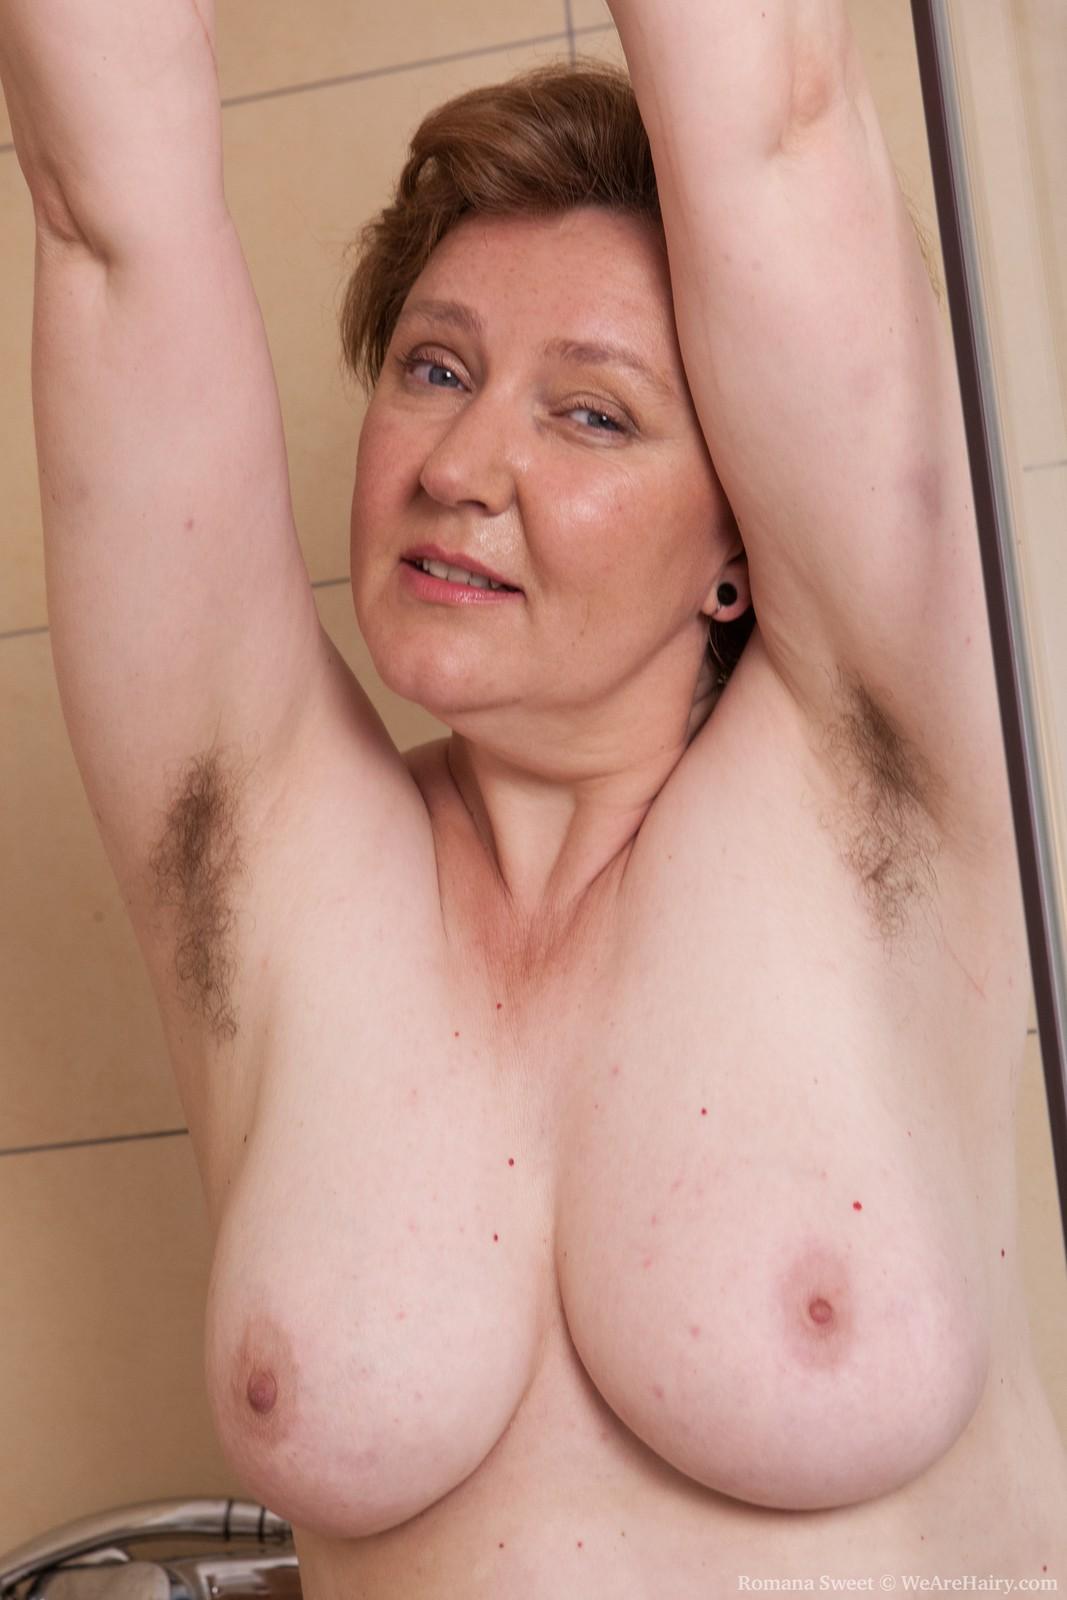 kartinki-o-golih-i-o-sekse